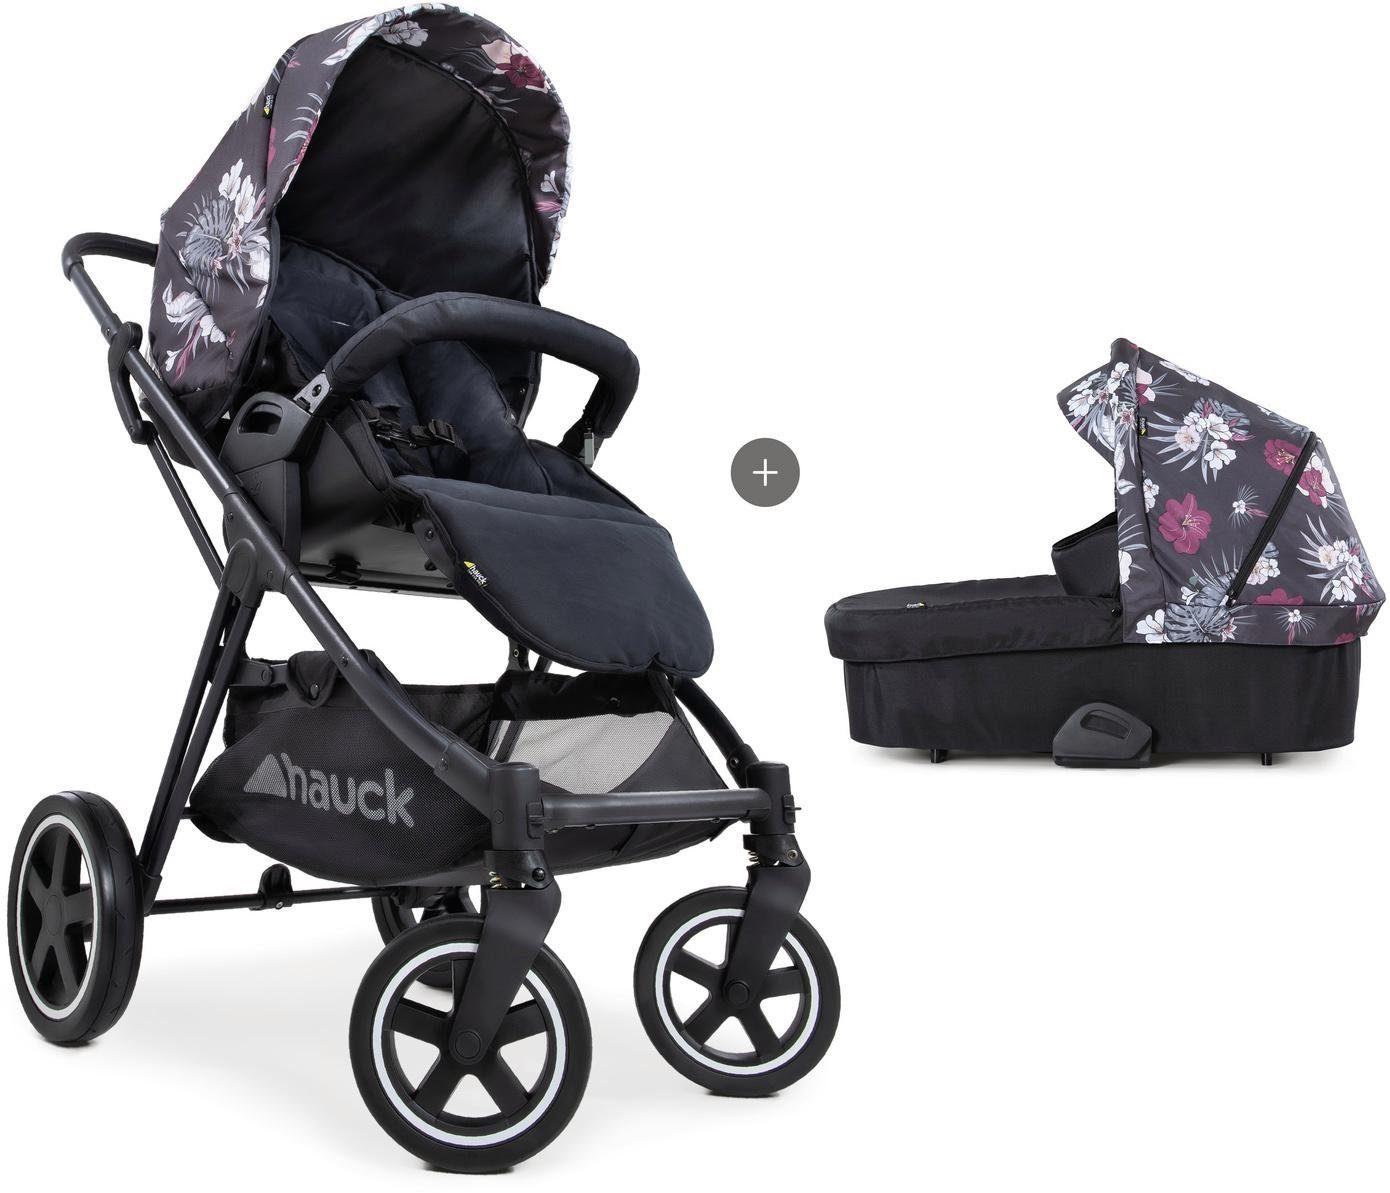 "Hauck Kombi-Kinderwagen ""iPro Mars Duoset wild blooms"" Kindermode/Ausstattung/Kinderwagen & Buggies/Kinderwagen/Kombikinderwagen"